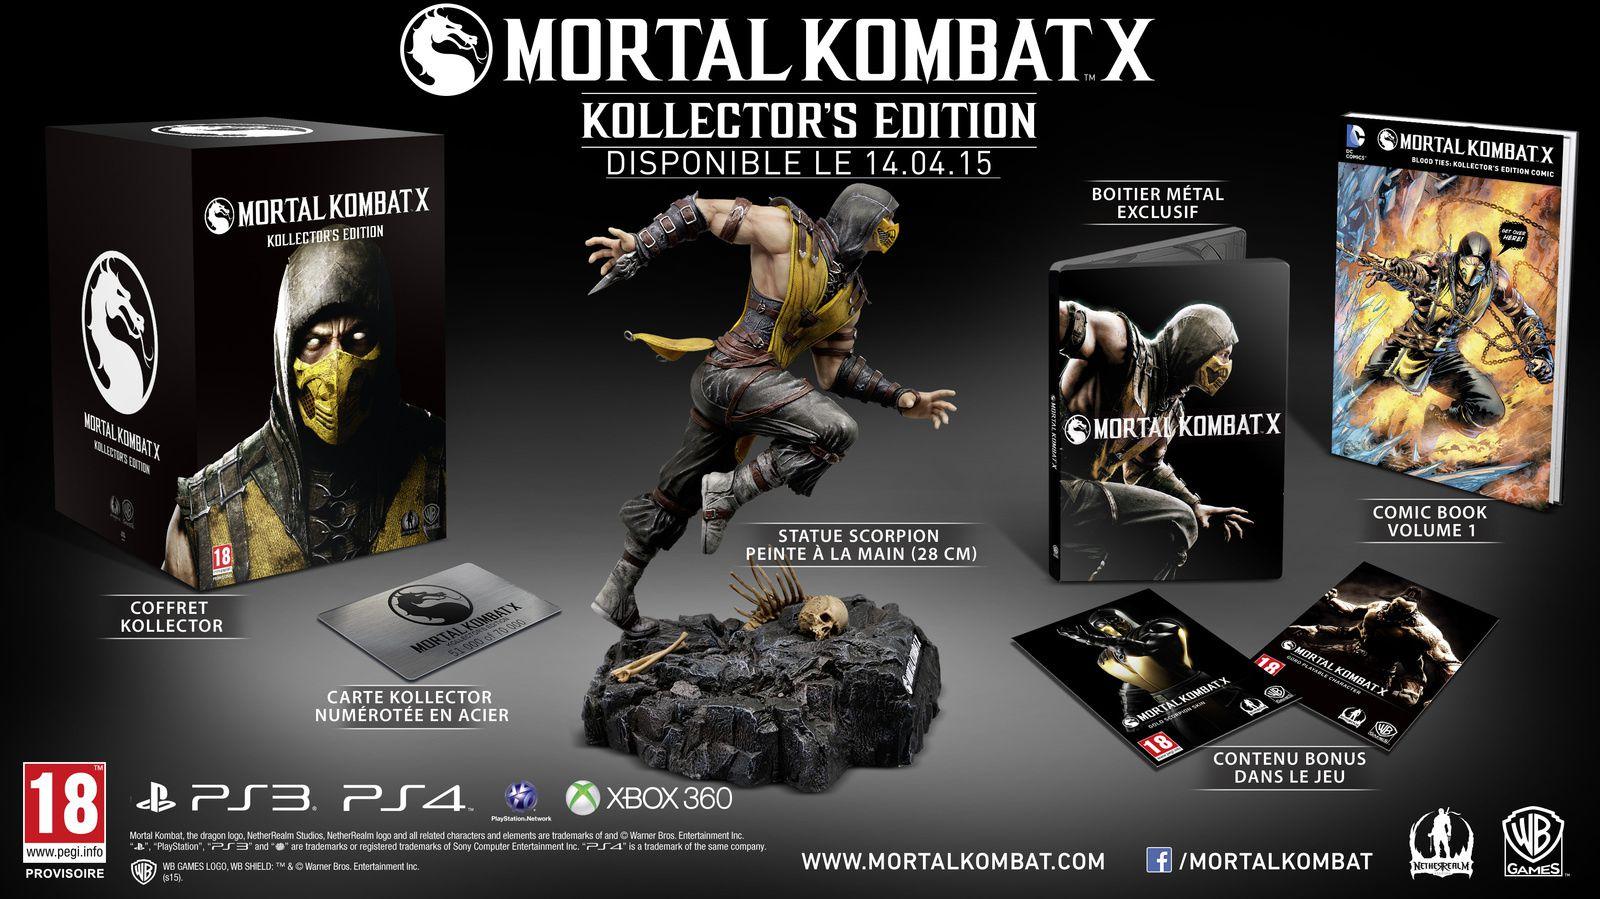 Les Kollectors de Mortal Kombat se dévoilent